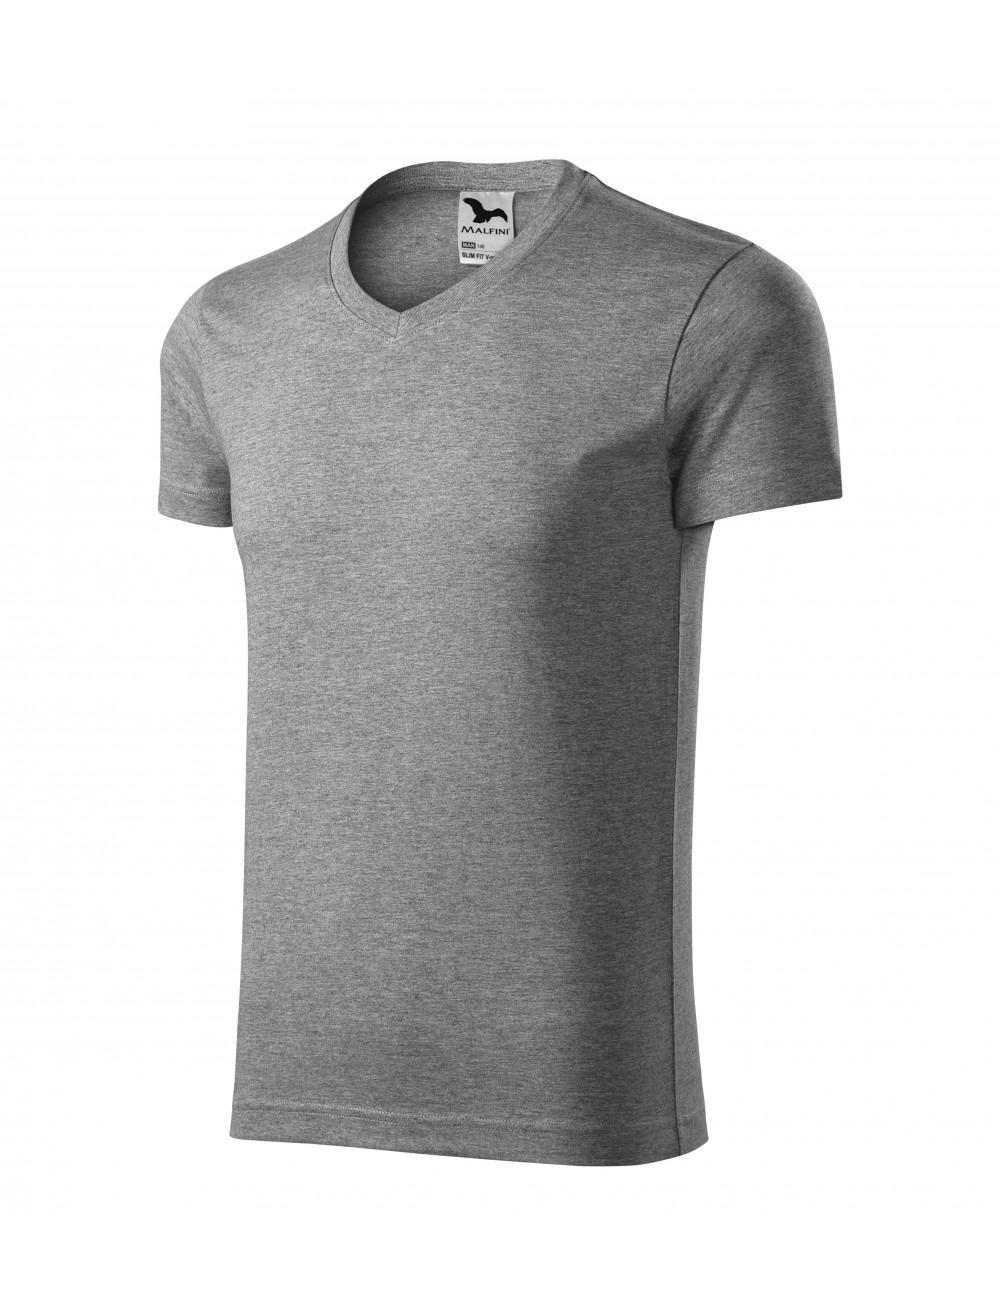 Adler MALFINI Koszulka męska Slim Fit V-neck 146 ciemnoszary melanż